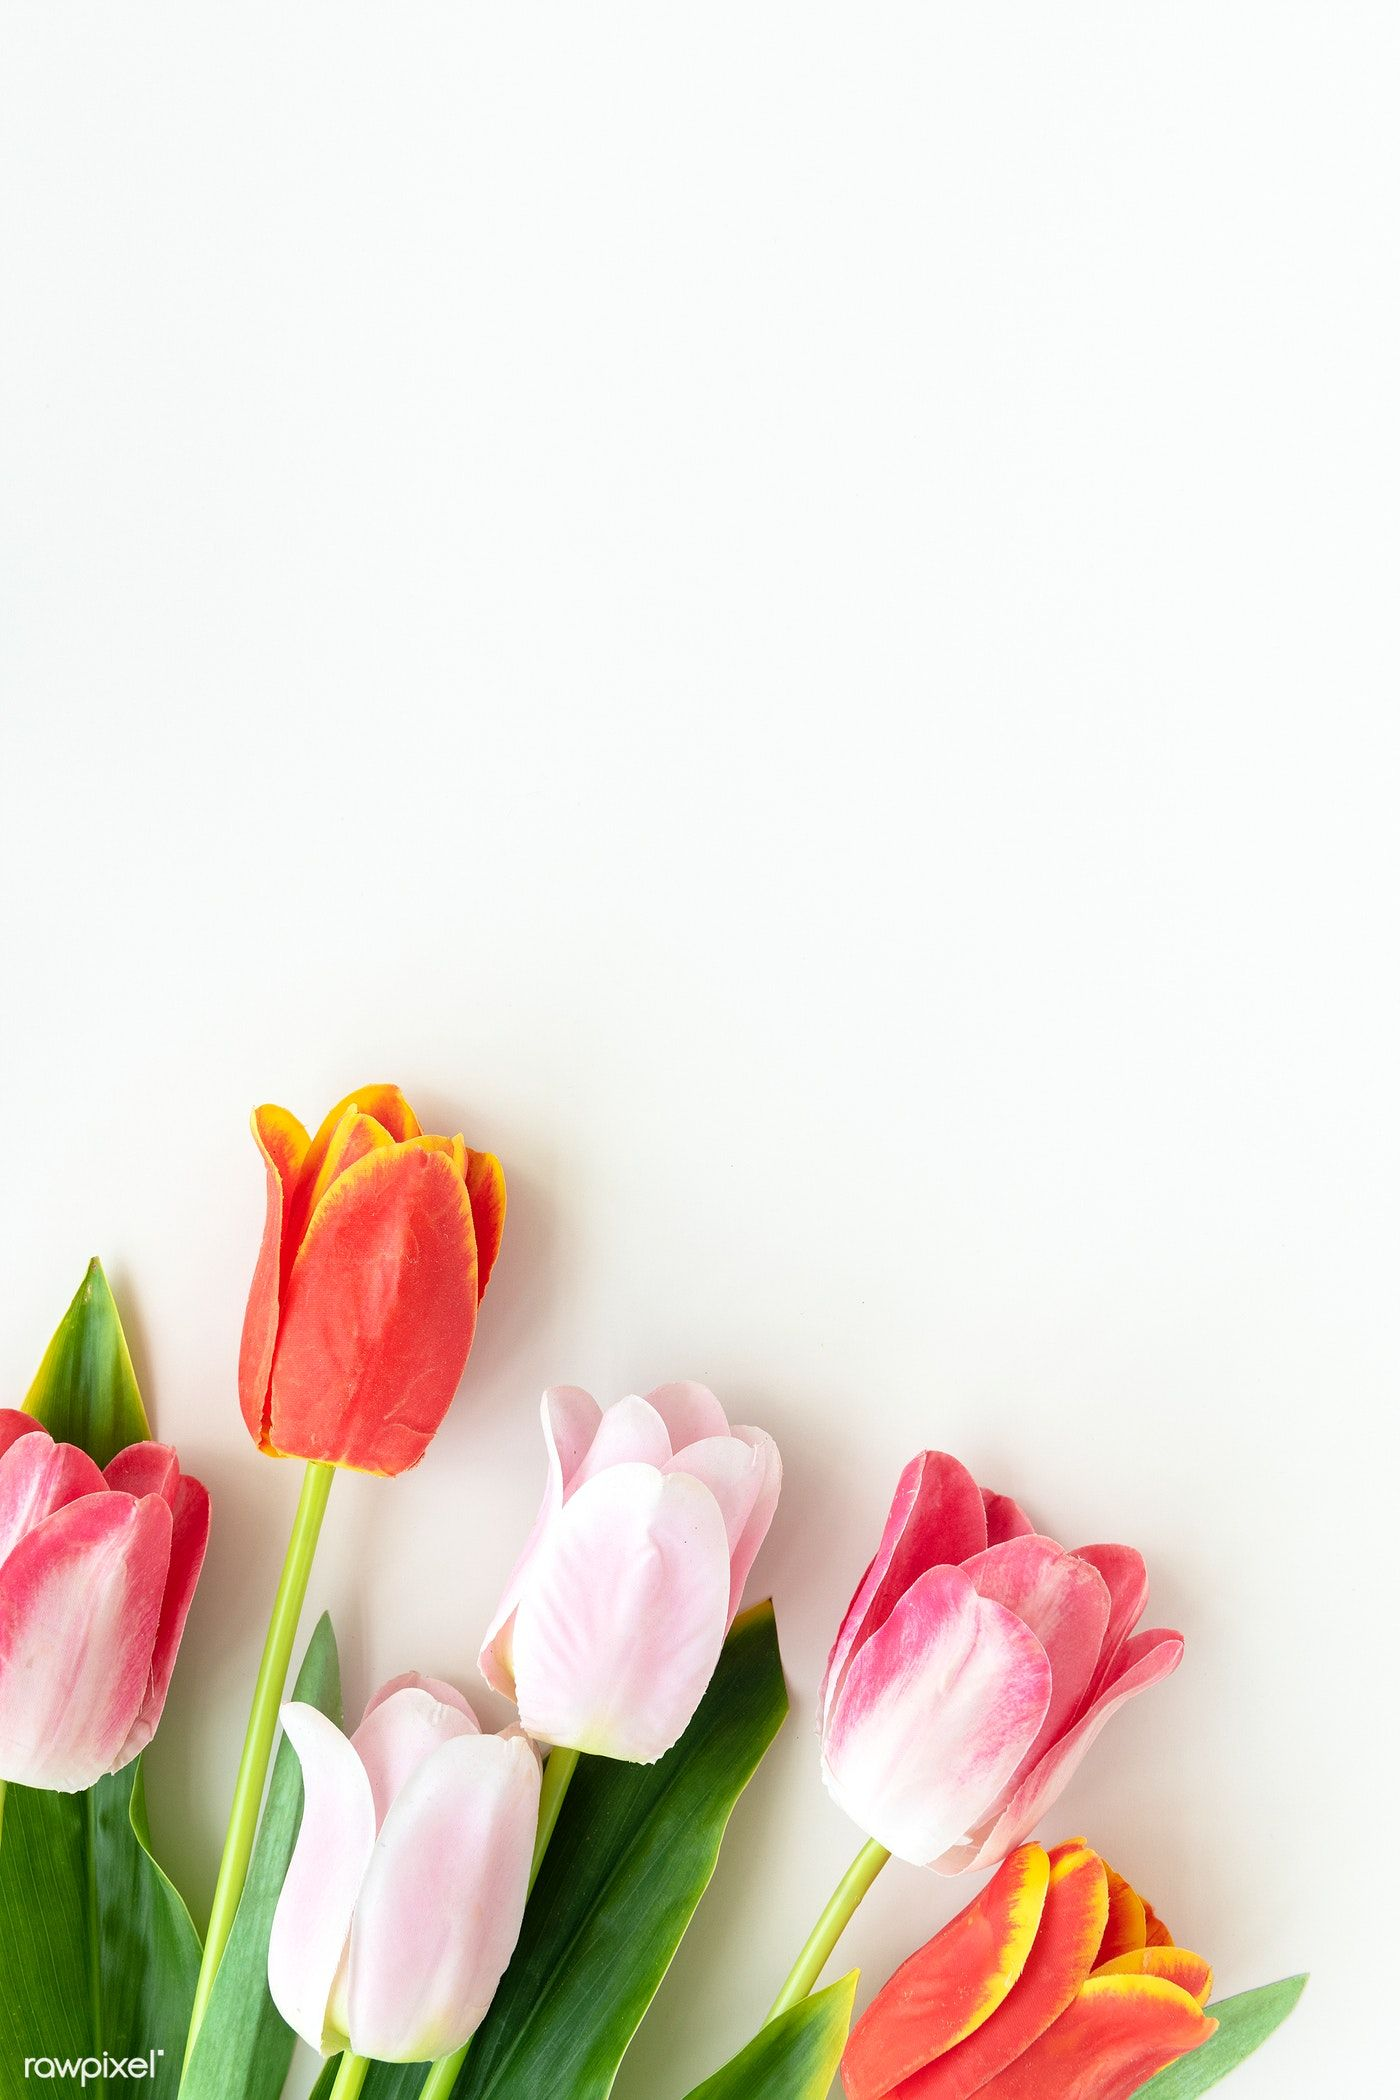 White Tulips Wallpapers Hd White Tulips Tulips Flowers White Flowers Garden